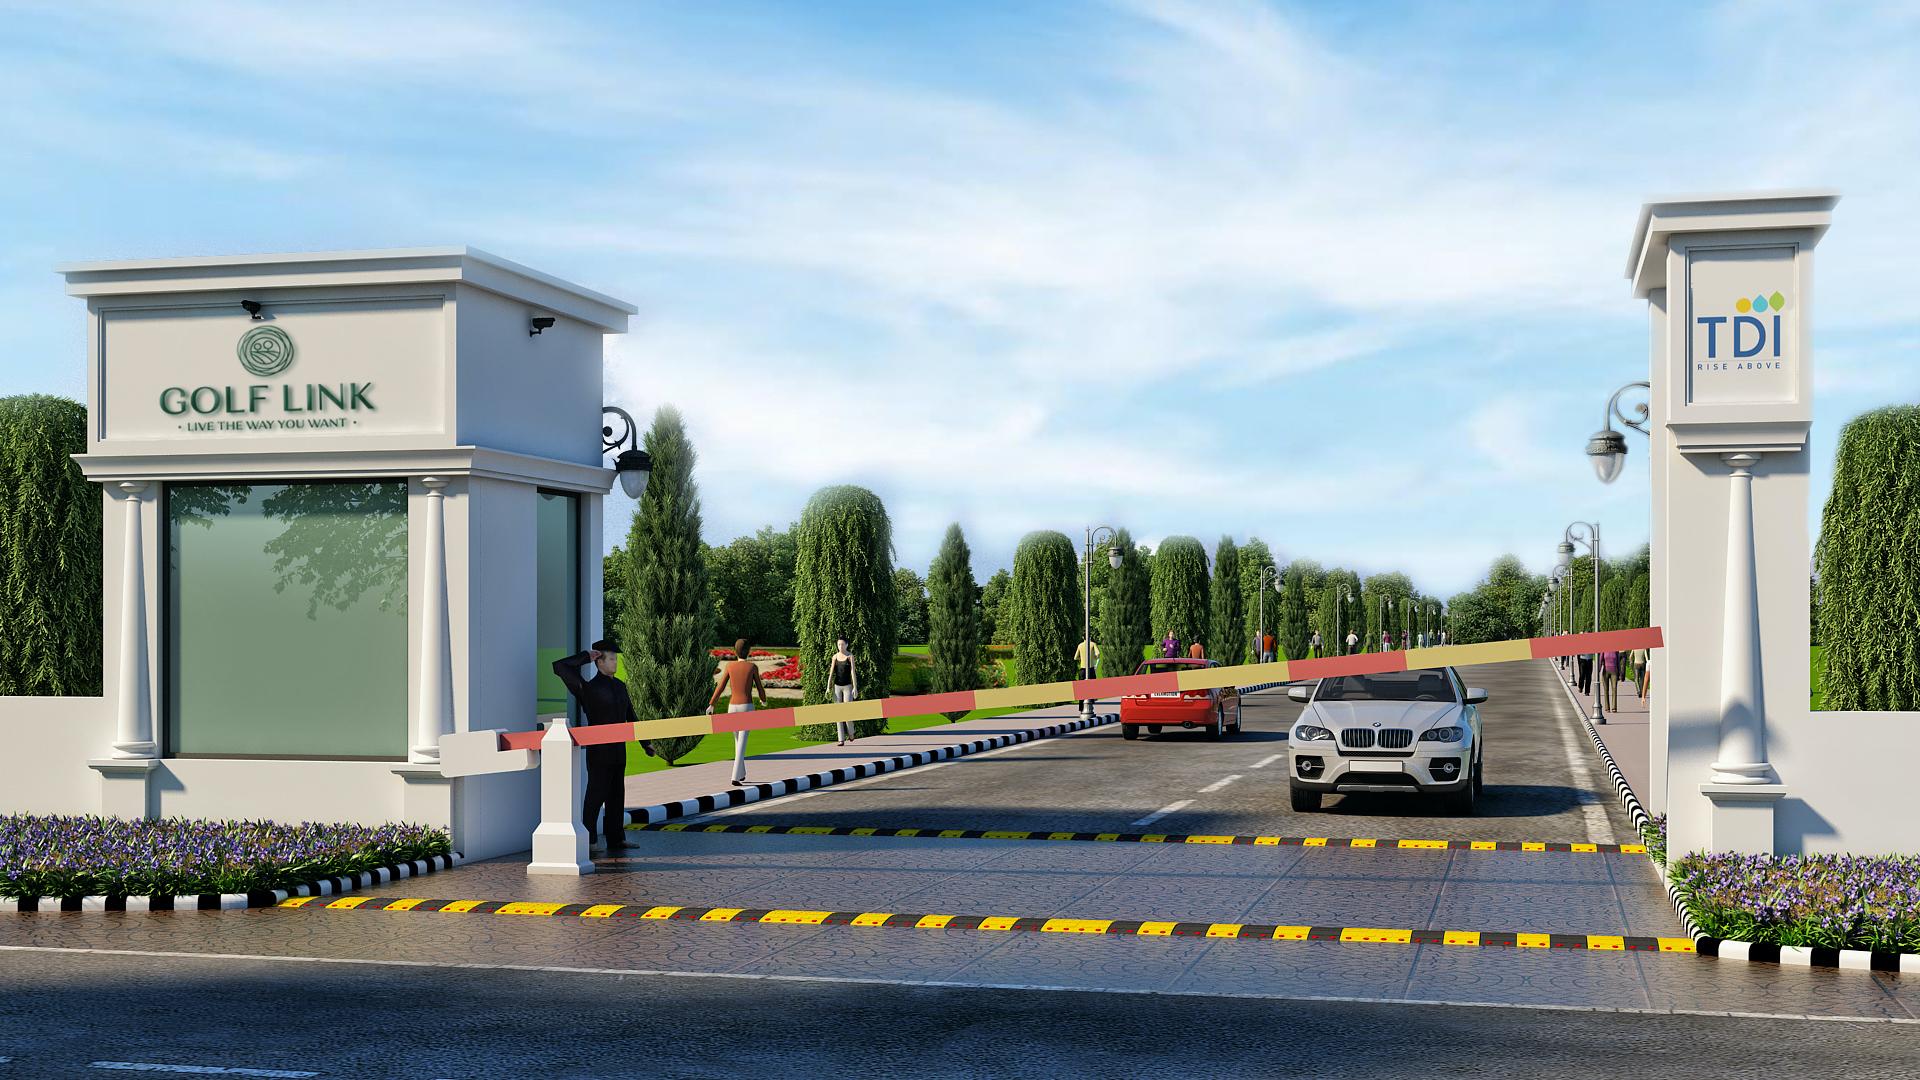 Golf Link, Sector 118, TDI Smart City, Mohali